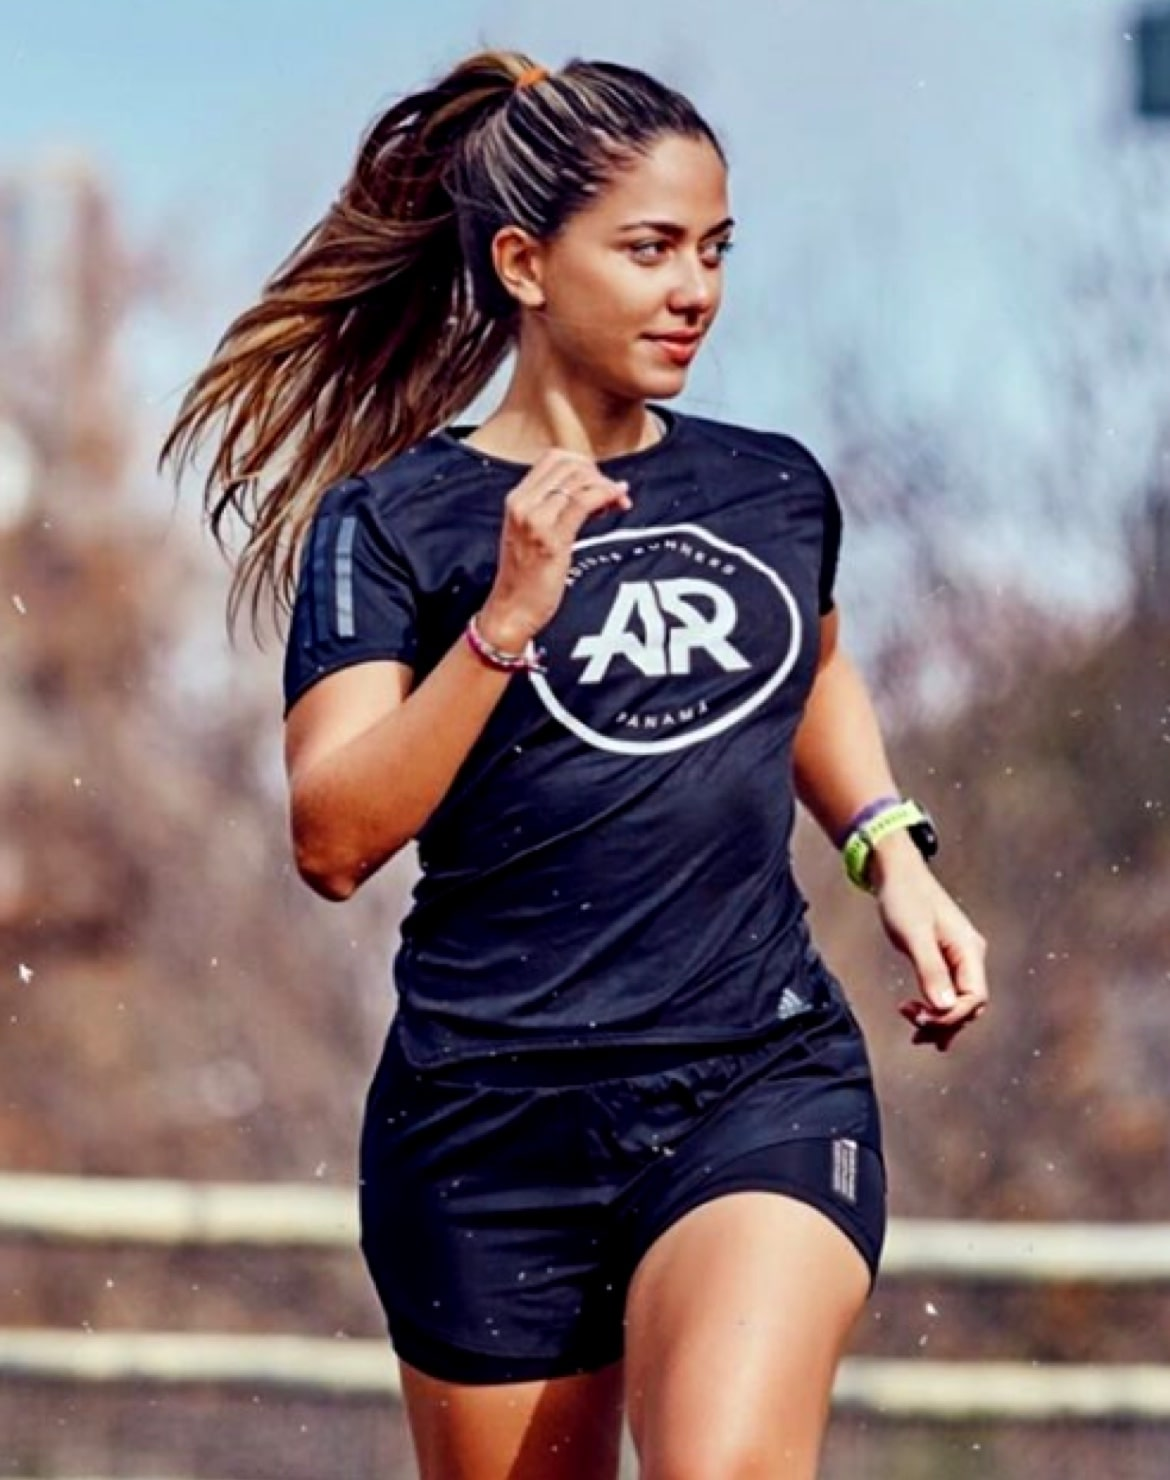 Young woman running in Adidas Run Club black shirt